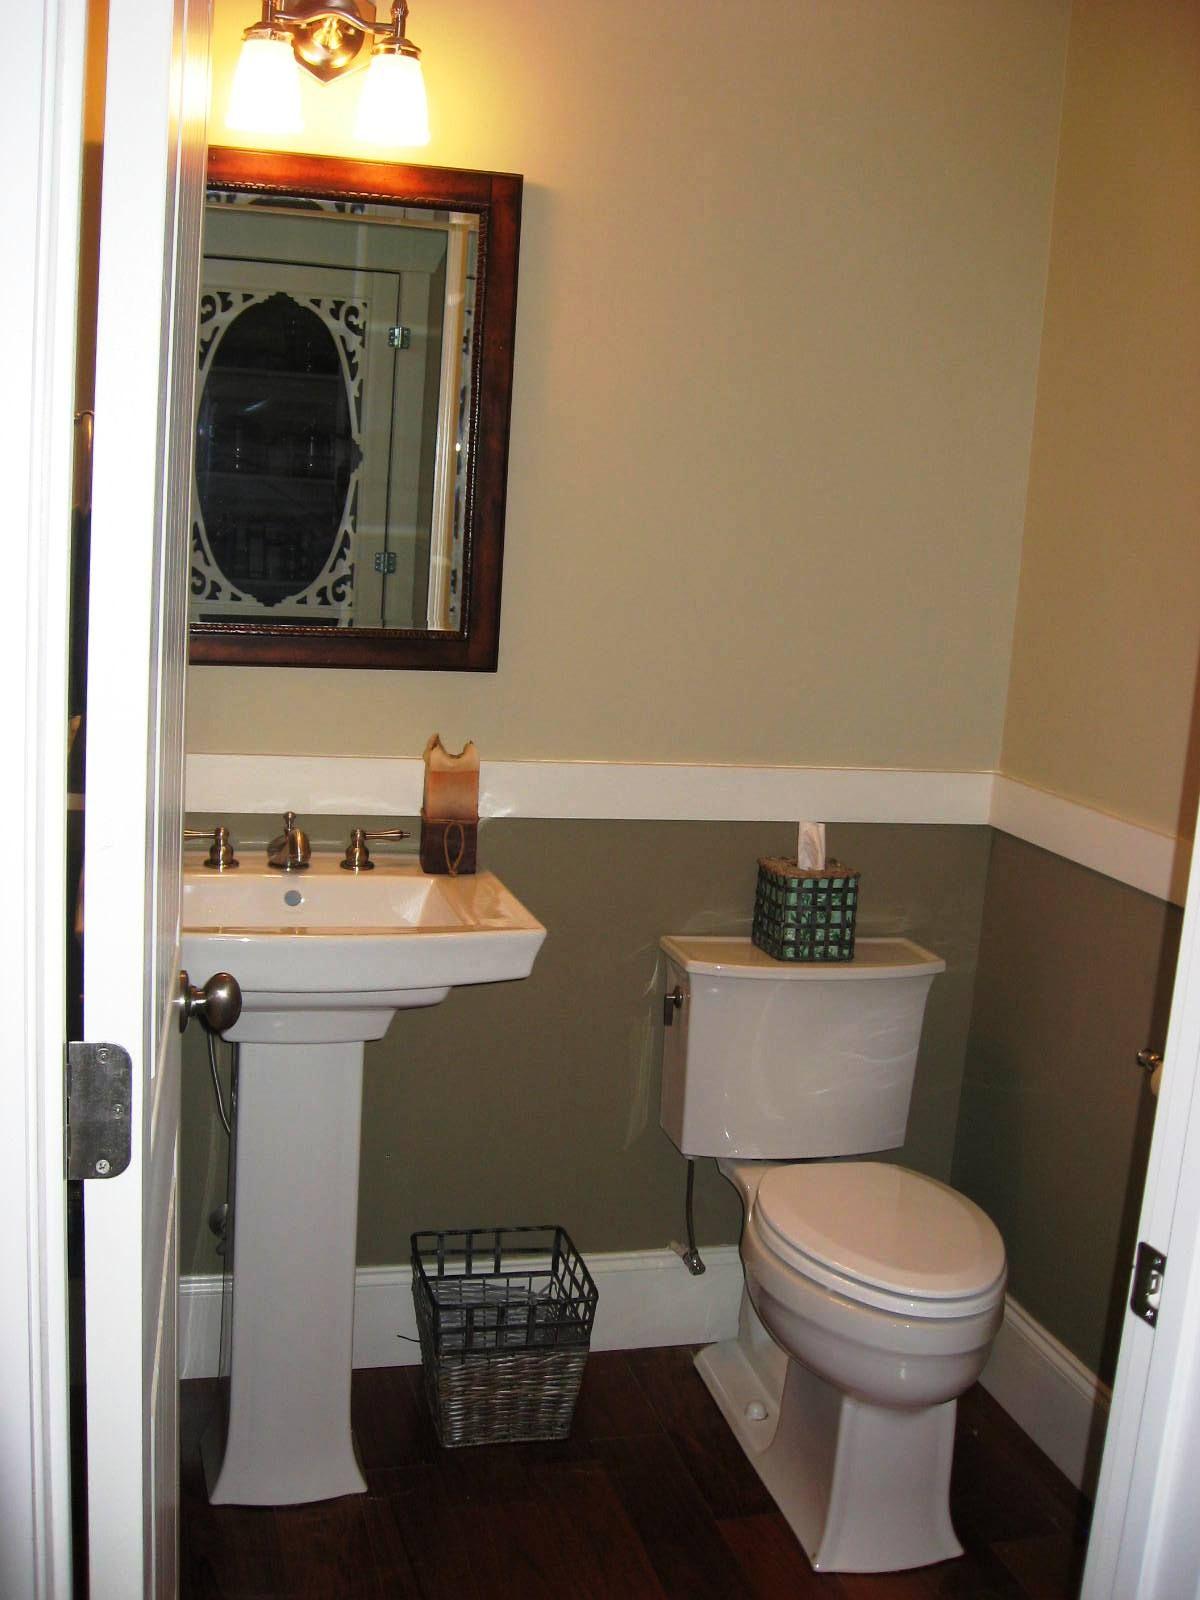 Half bath idea diffferent color scheme though ideas - Half bathroom remodel ideas ...